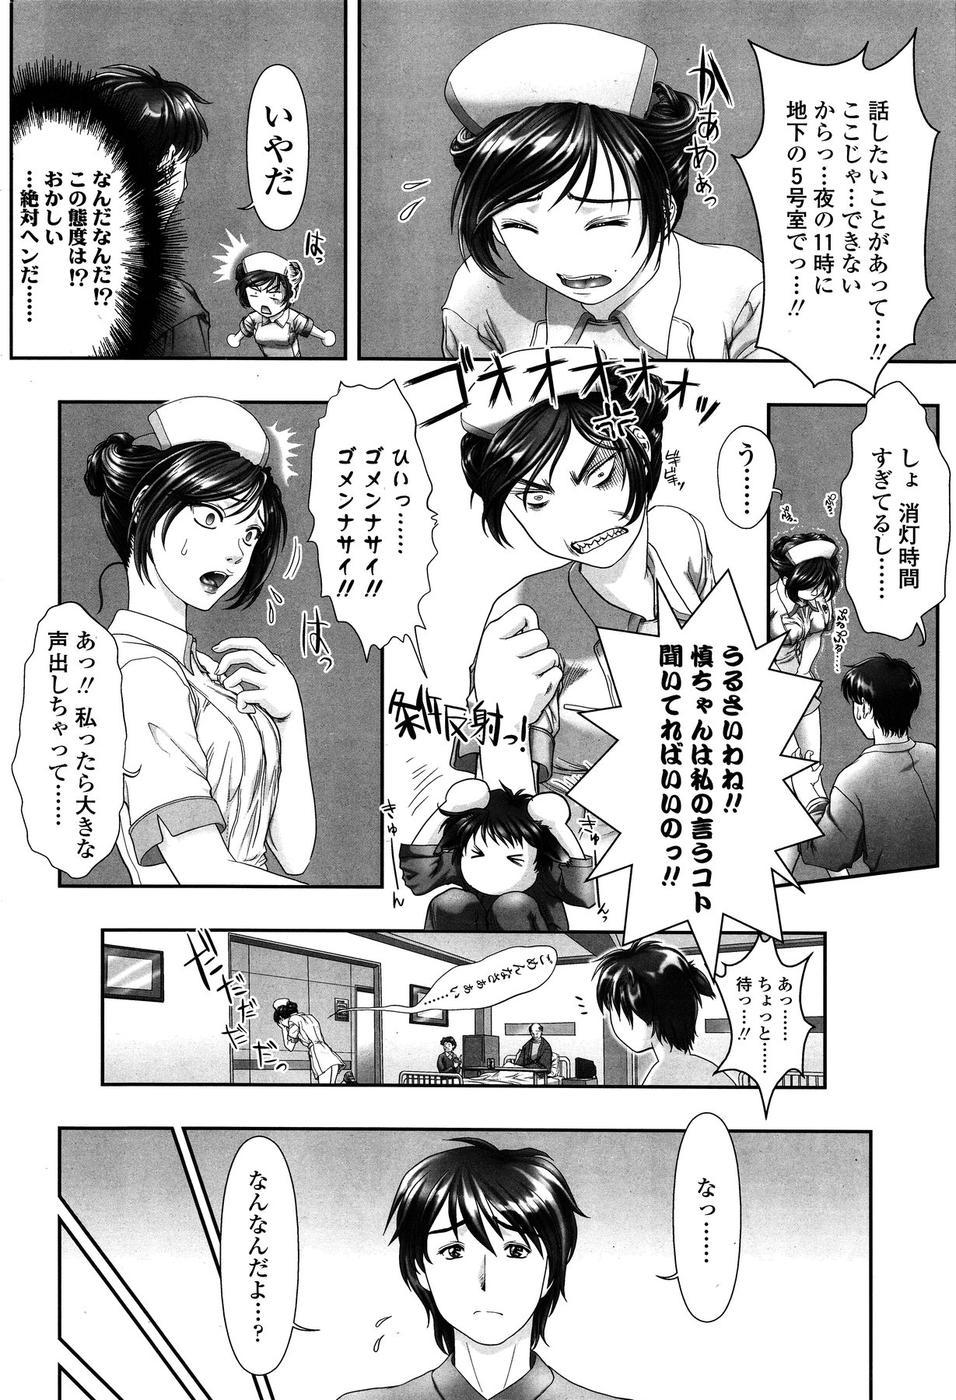 COMIC SIGMA 2009-01 Vol.28 24